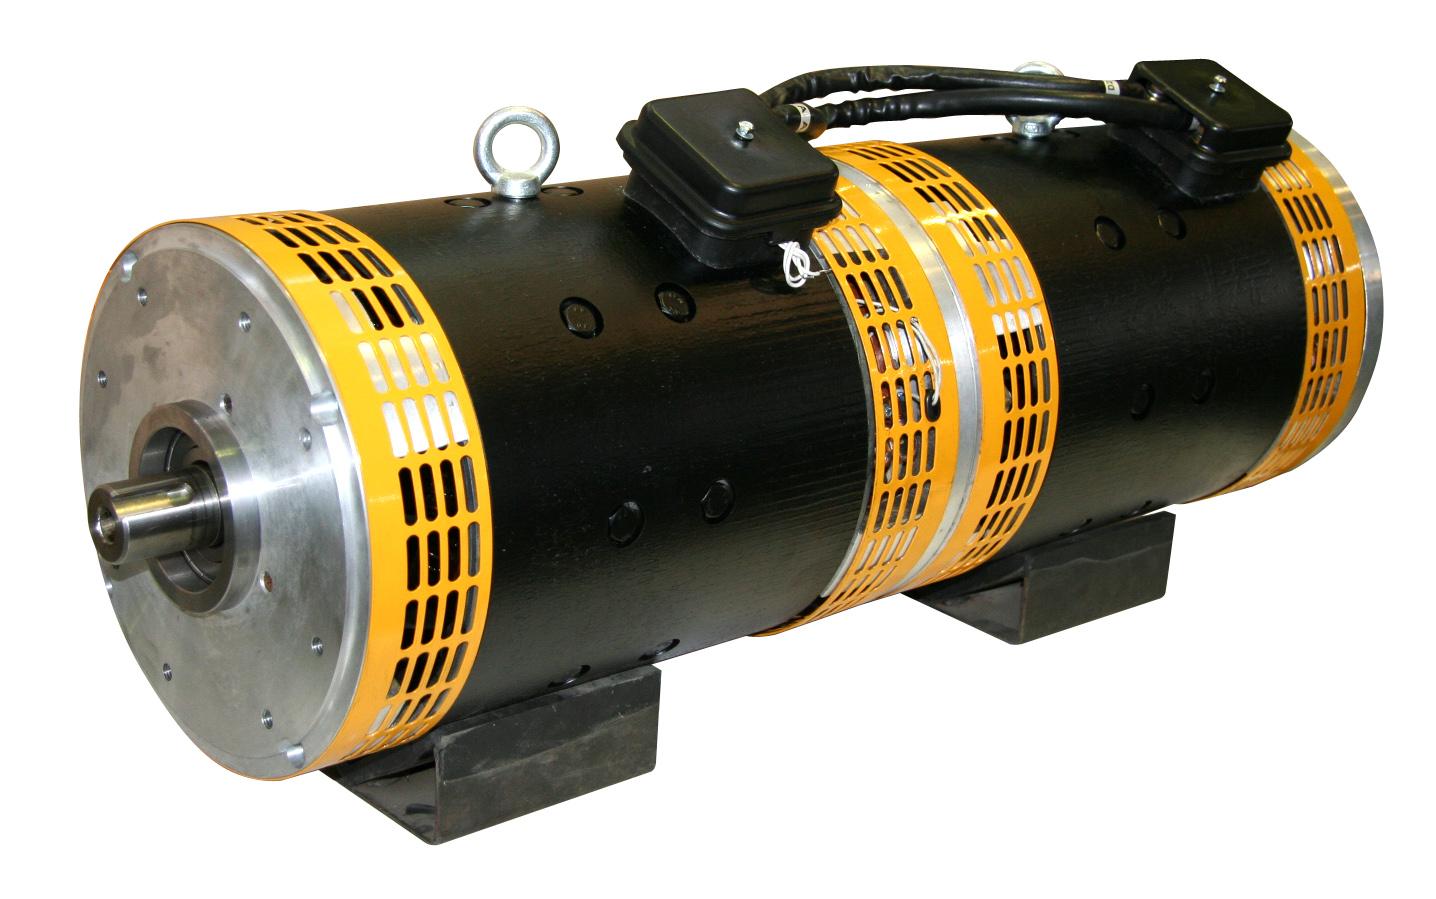 Warp 9 motor kw for Impulse 9 electric motor